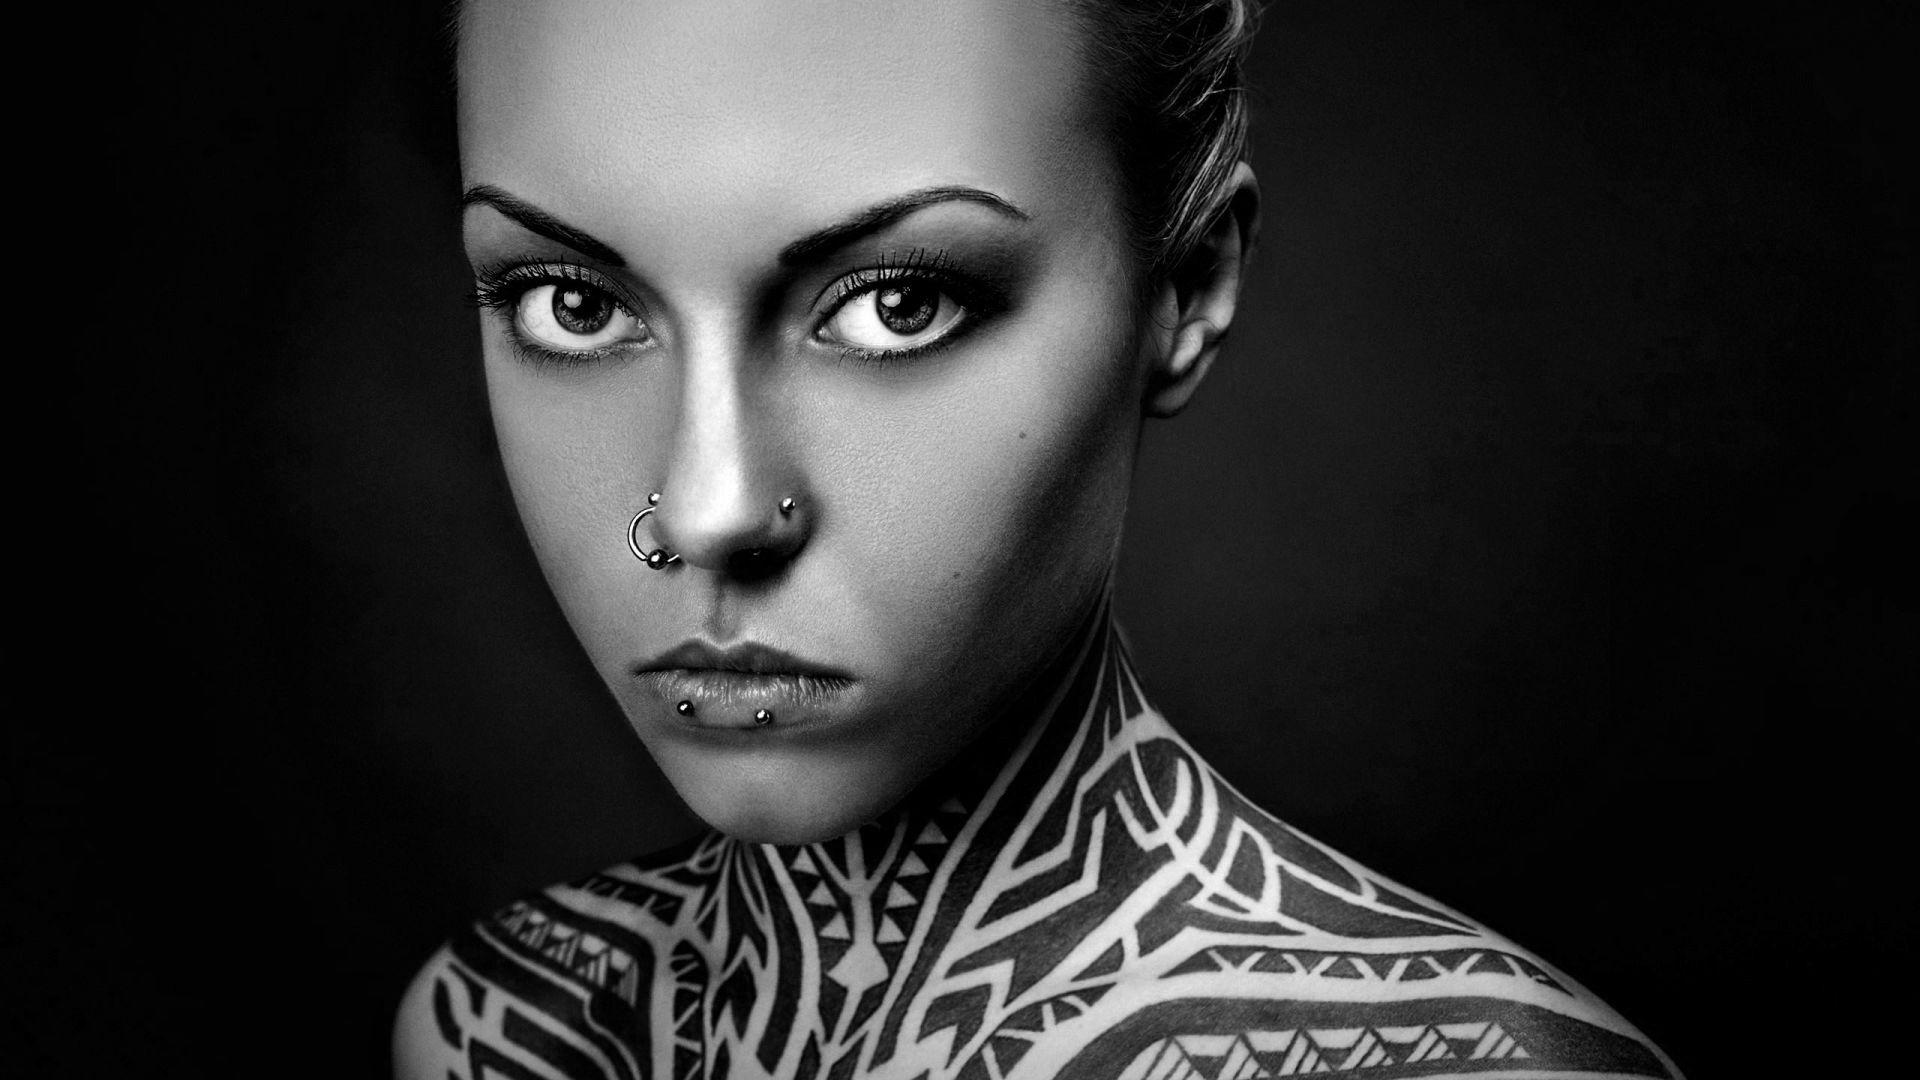 Tattoo Girl Von - Tattoo girl